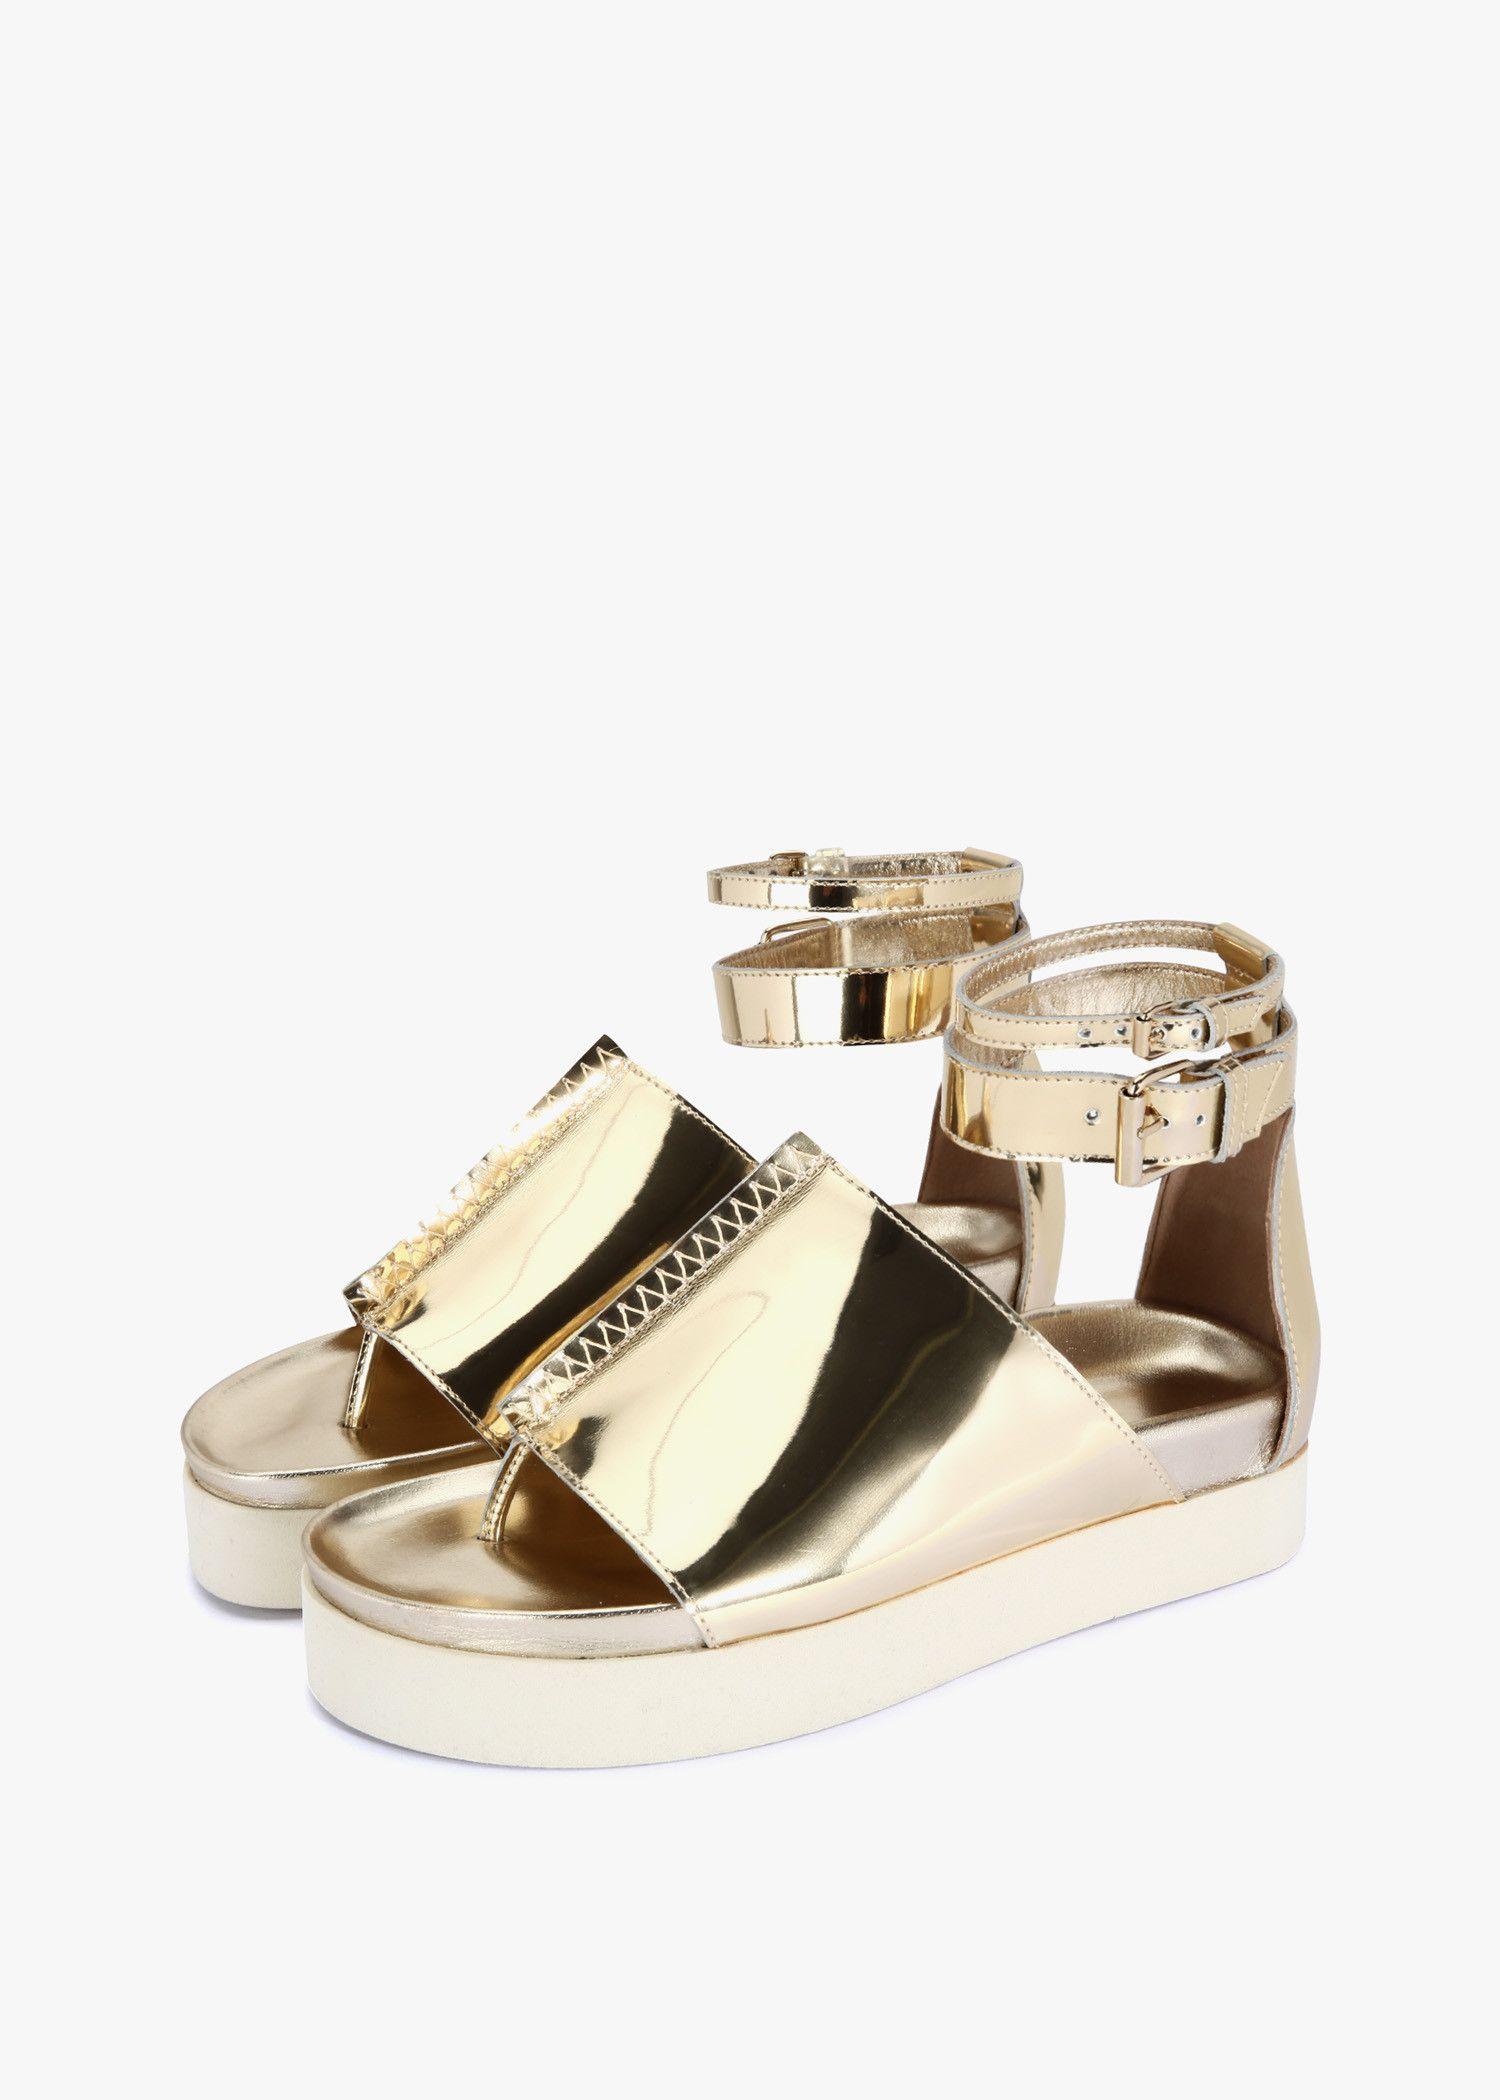 6e83b9924d96 Ellery Rhyme Flat Sandals